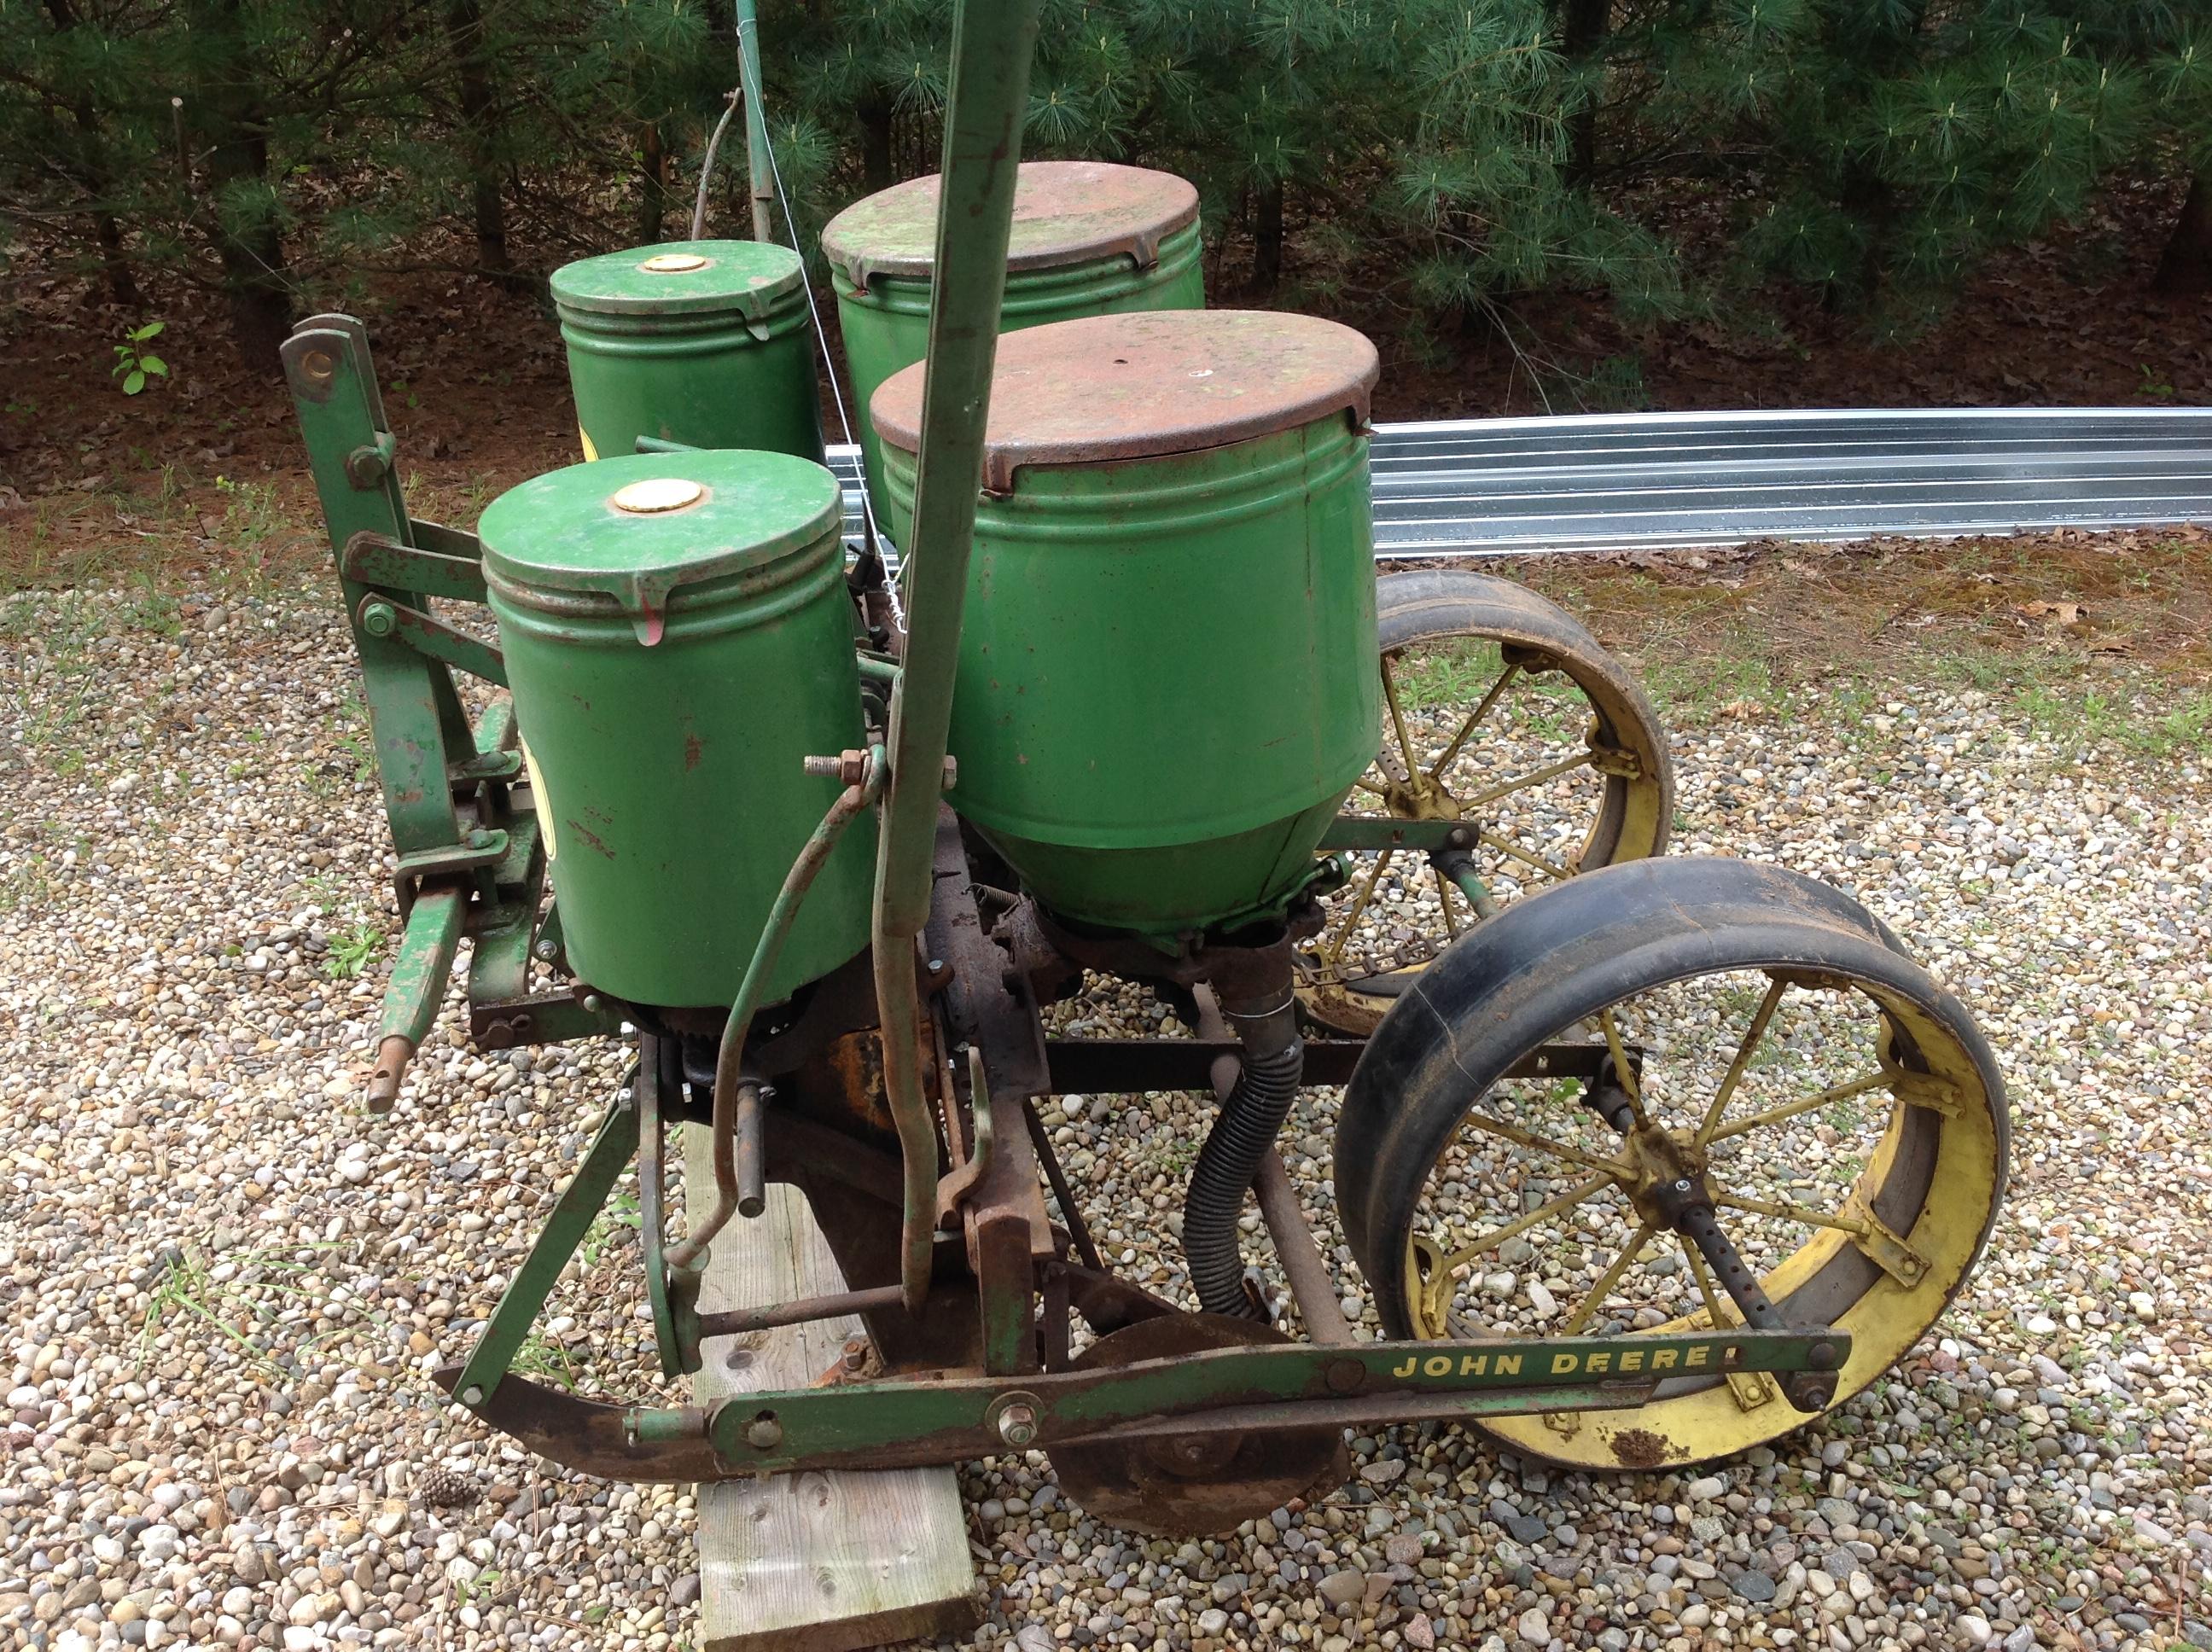 John Deere 246 247 3 Point Corn Planter | Michigan Sportsman ... on